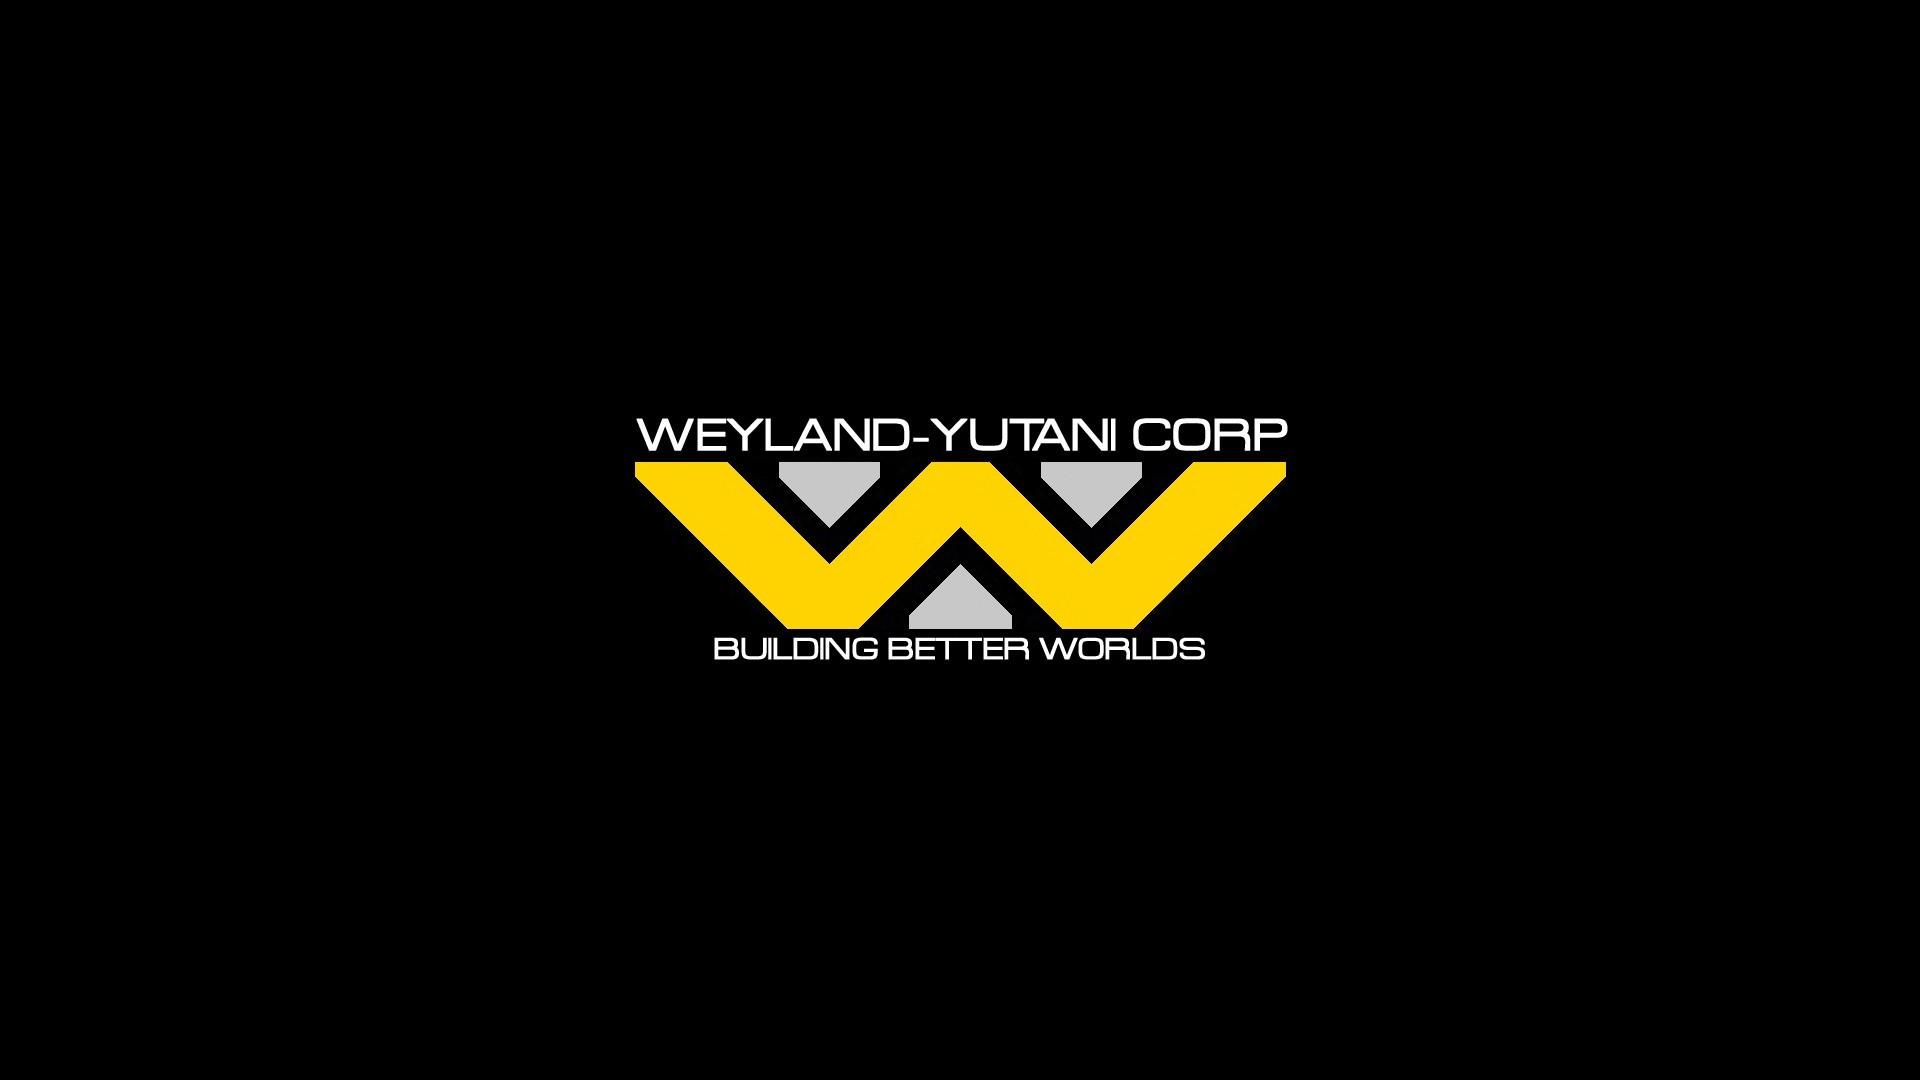 Res: 1920x1080, Weyland Yutani Corporation, Black Background, Logo, Typography, Minimalism,  Aliens (movie) Wallpapers HD / Desktop and Mobile Backgrounds